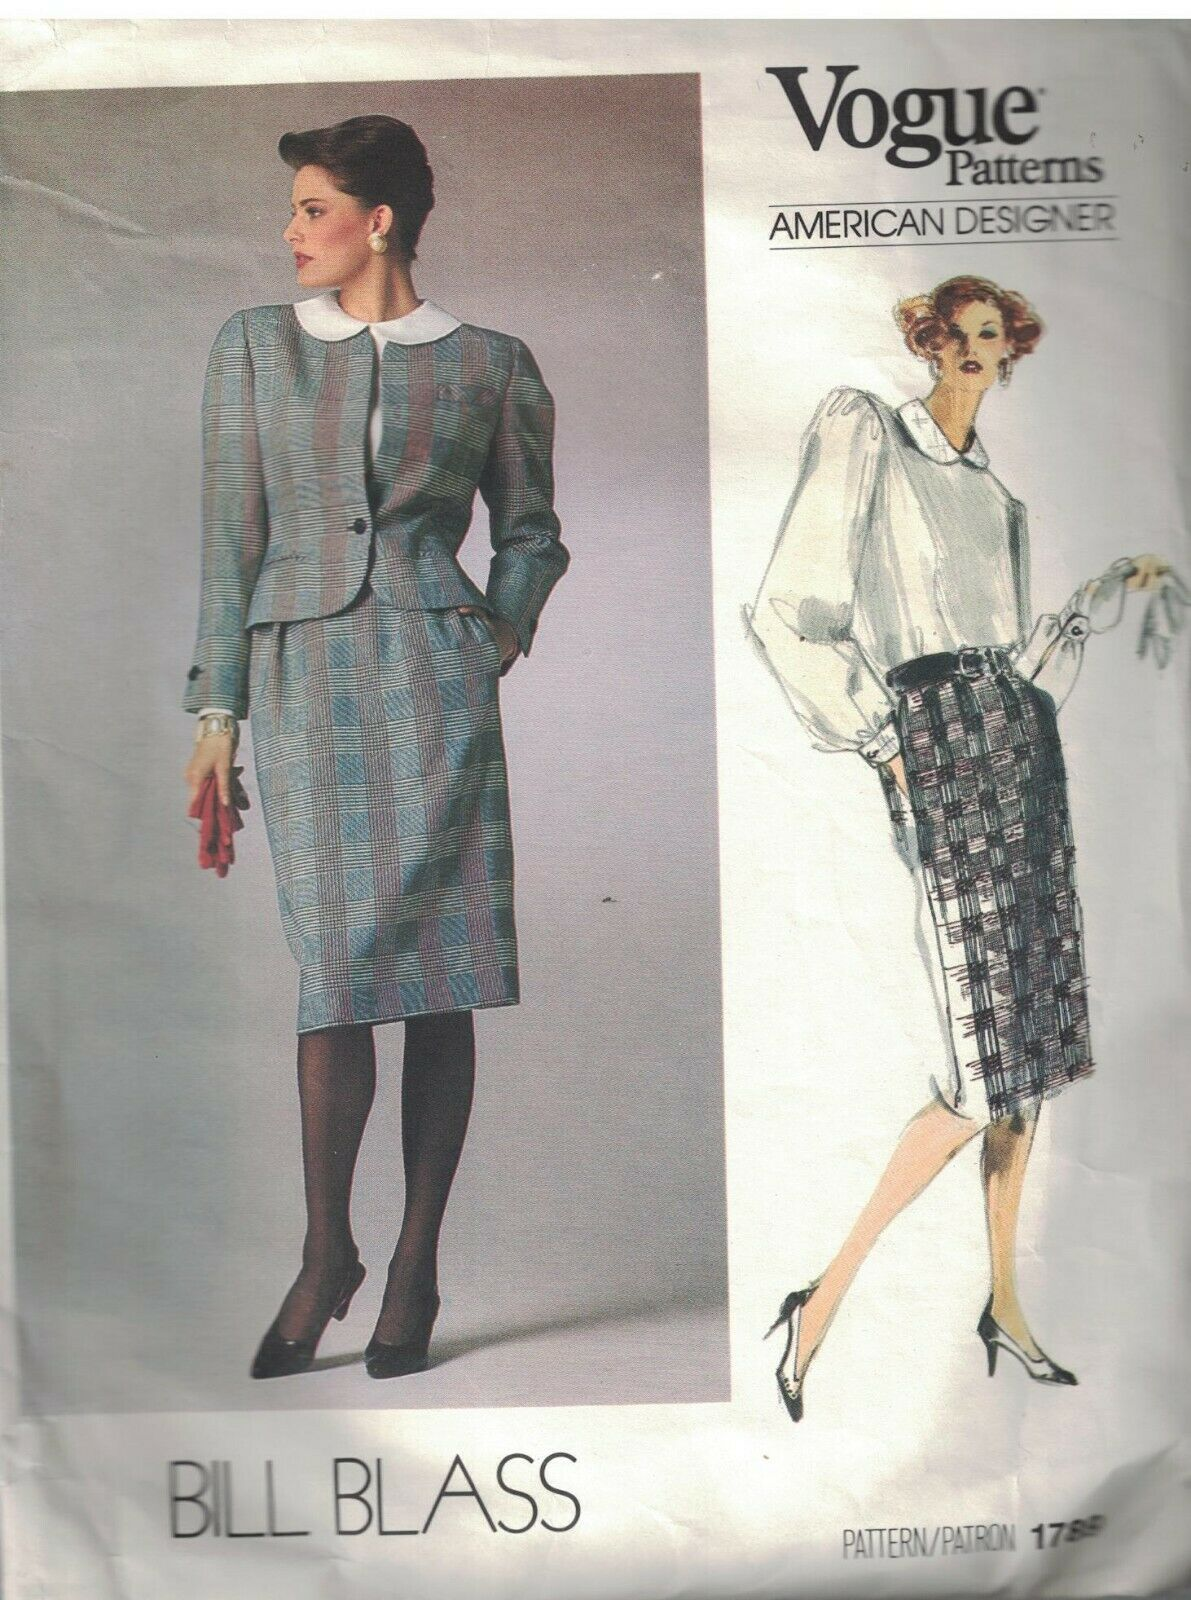 1789 Vogue Nähen Muster Misses Jacke Rock Bluse Bill Blass Amerikanisch Design